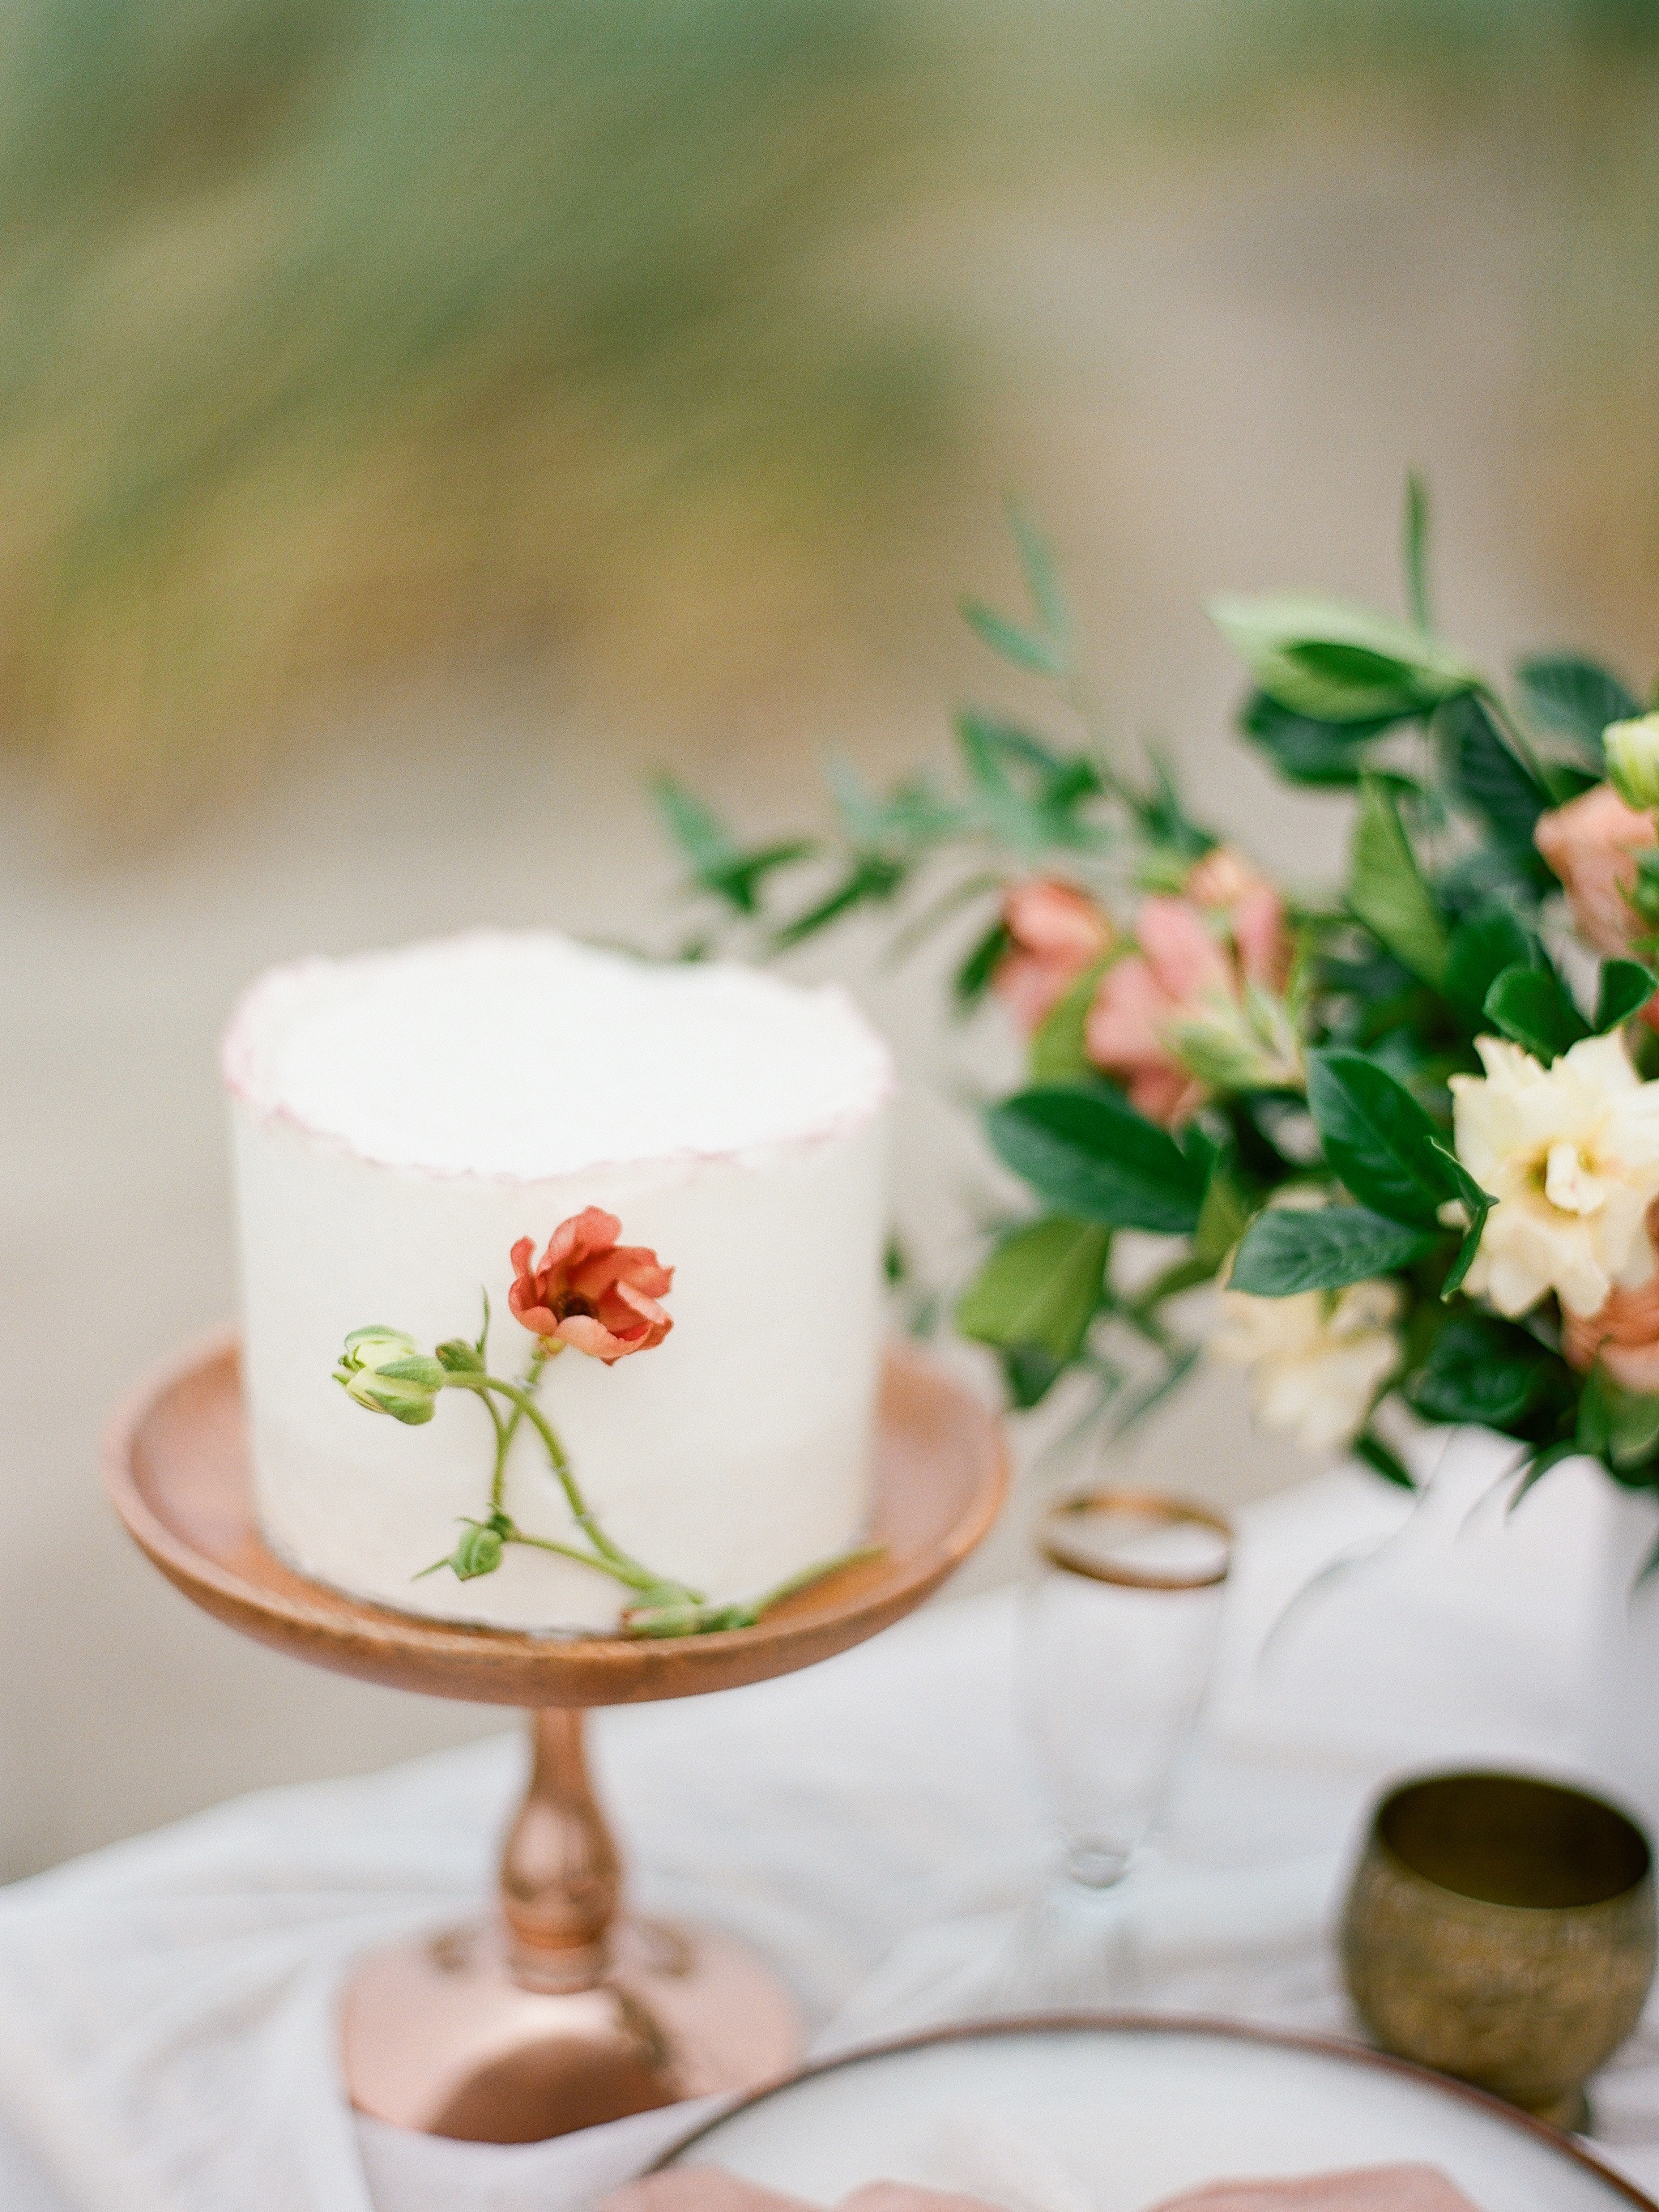 Muave simple wedding cake